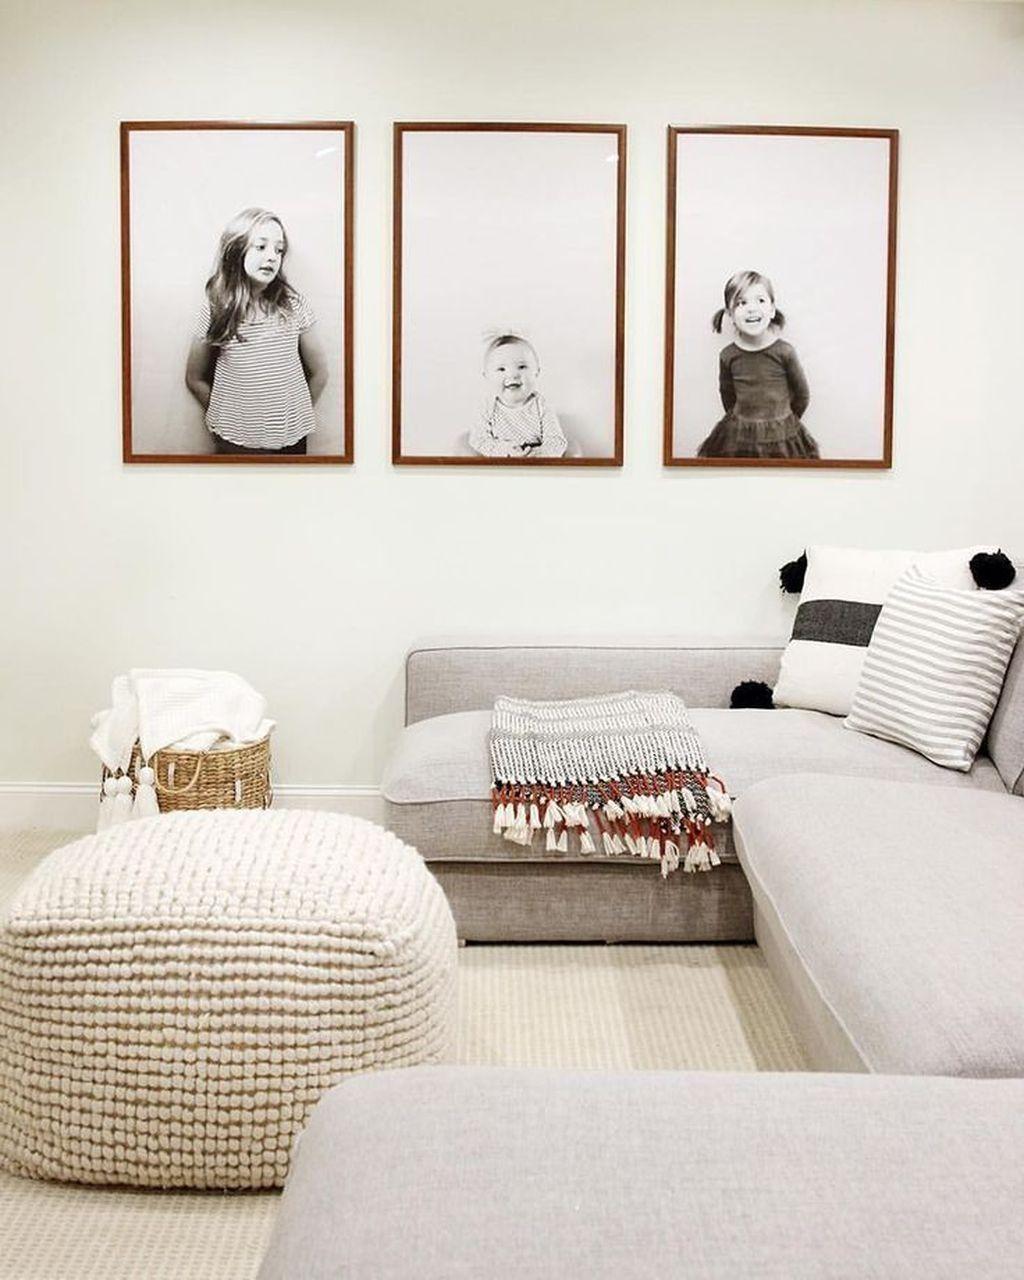 30 Impressive Minimalist Wall Art Decoration Ideas To Copy Right Now Minimalist Home Decor Minimalist Home Home Decor